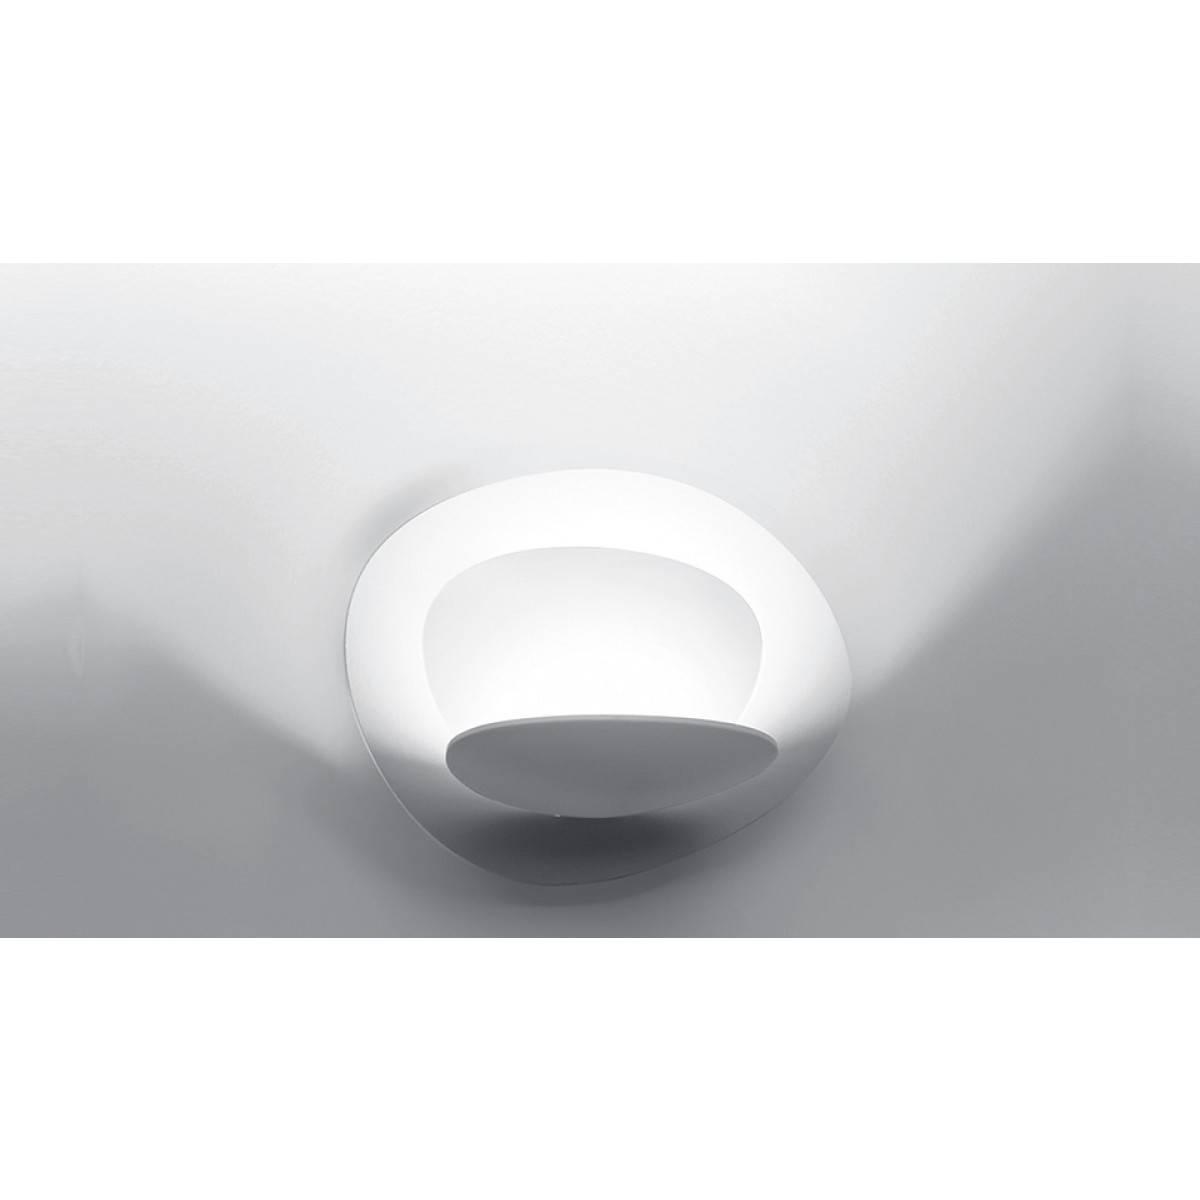 https://www.arteluceonline.com/4088/artemide-lampada-da-parete-pirce-micro-led.jpg